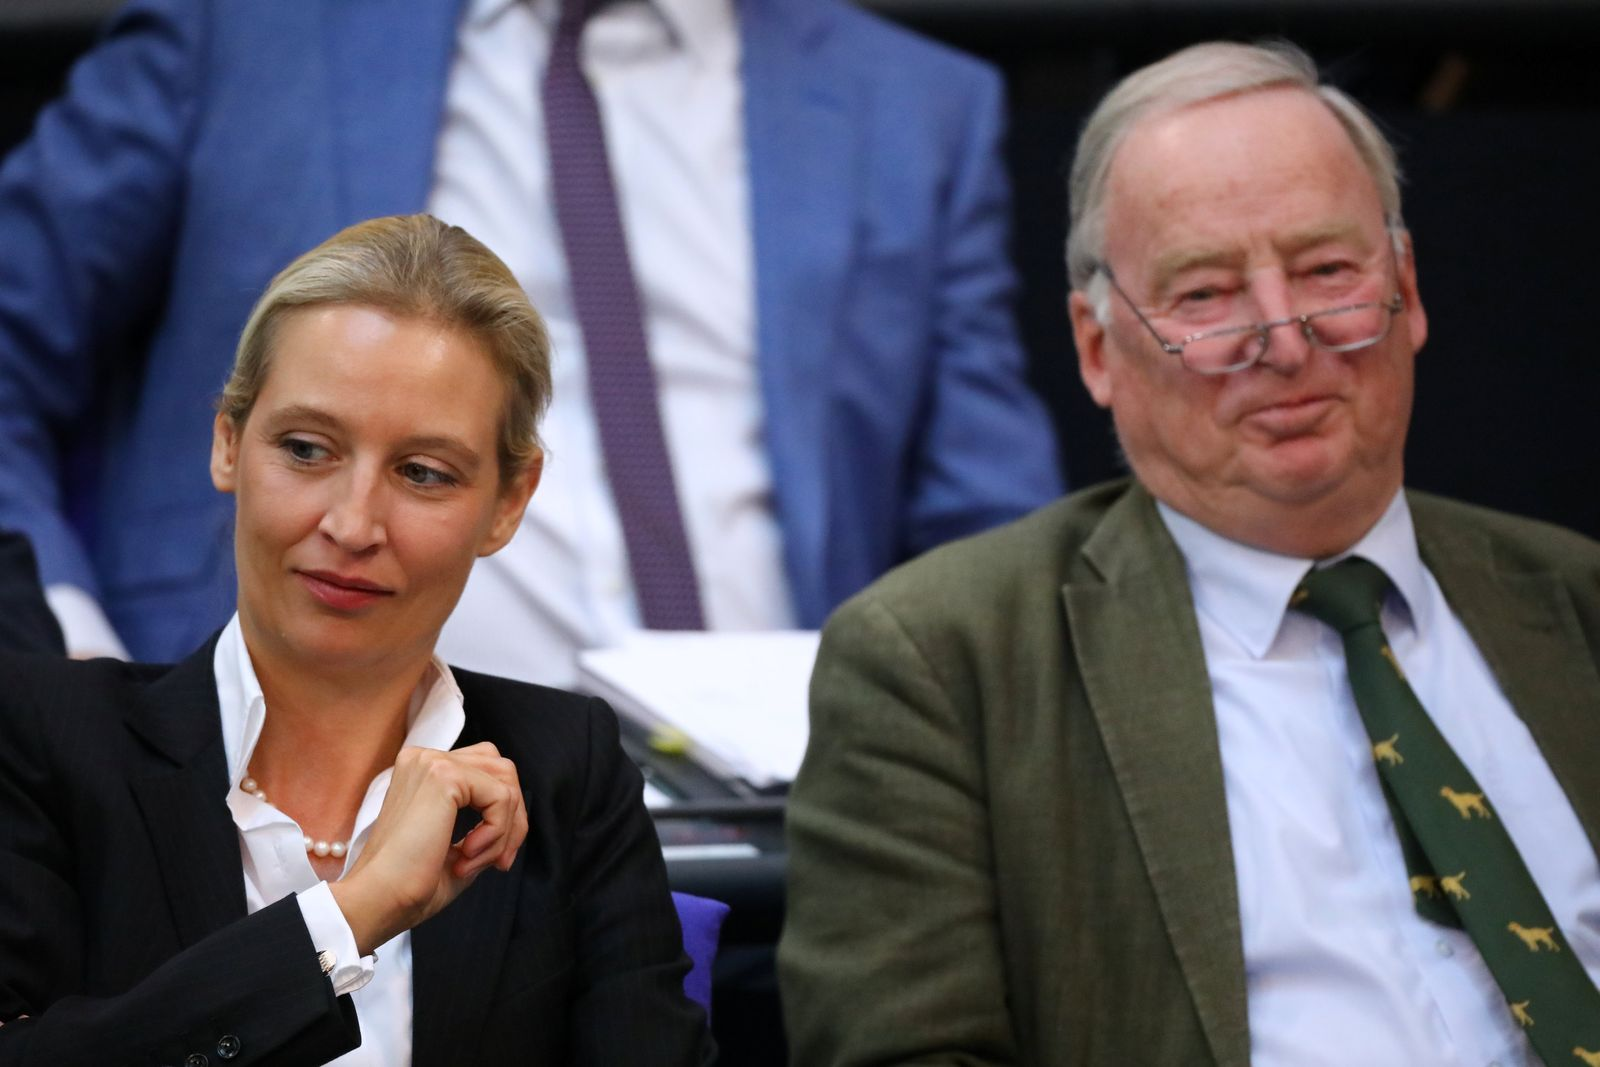 GERMANY-POLITICS/BUDGET